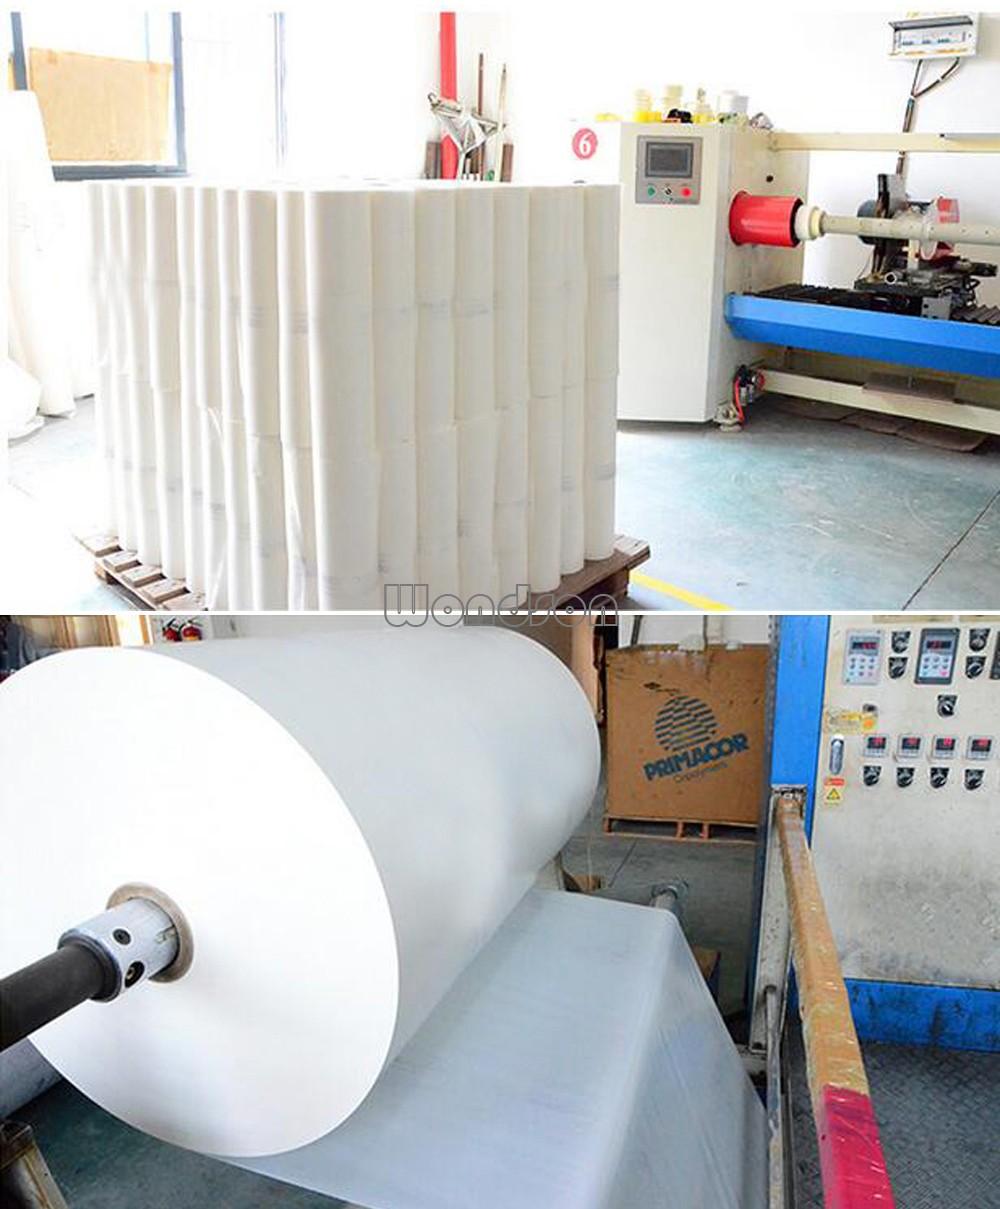 Bonding Trim Molding Laminating Melamine Eva Hot Melt Adhesive Film - Buy  Eva Hot Melt Adhesive Film,Bonding Trim Adhesive Film,Molding Laminating